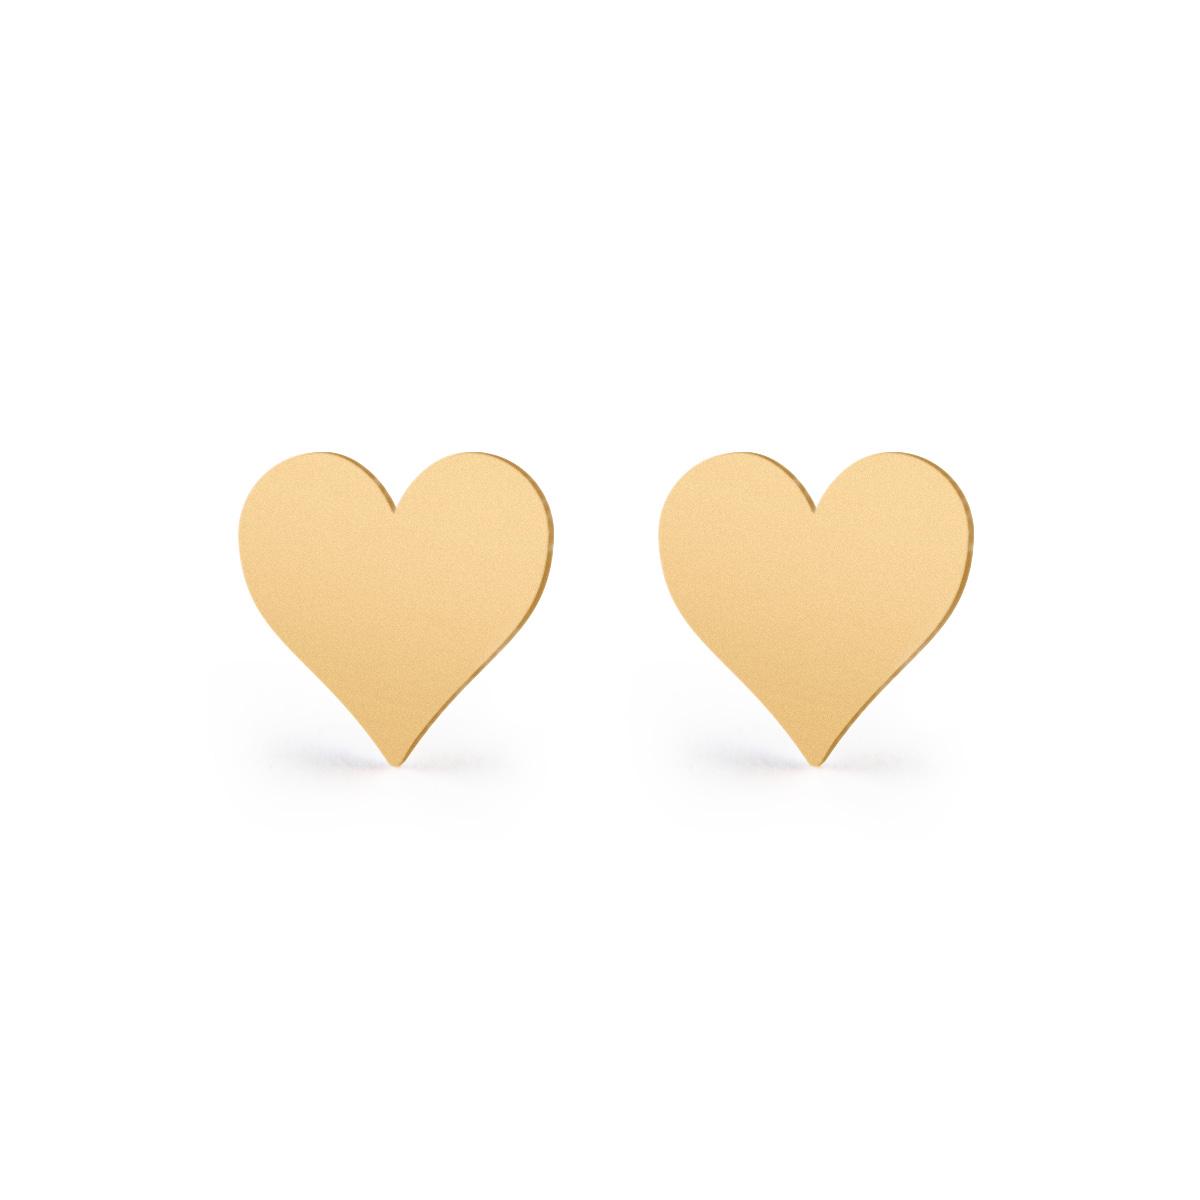 گوشواره طلا 18 عیار زنانه ریسه گالری کد 3024